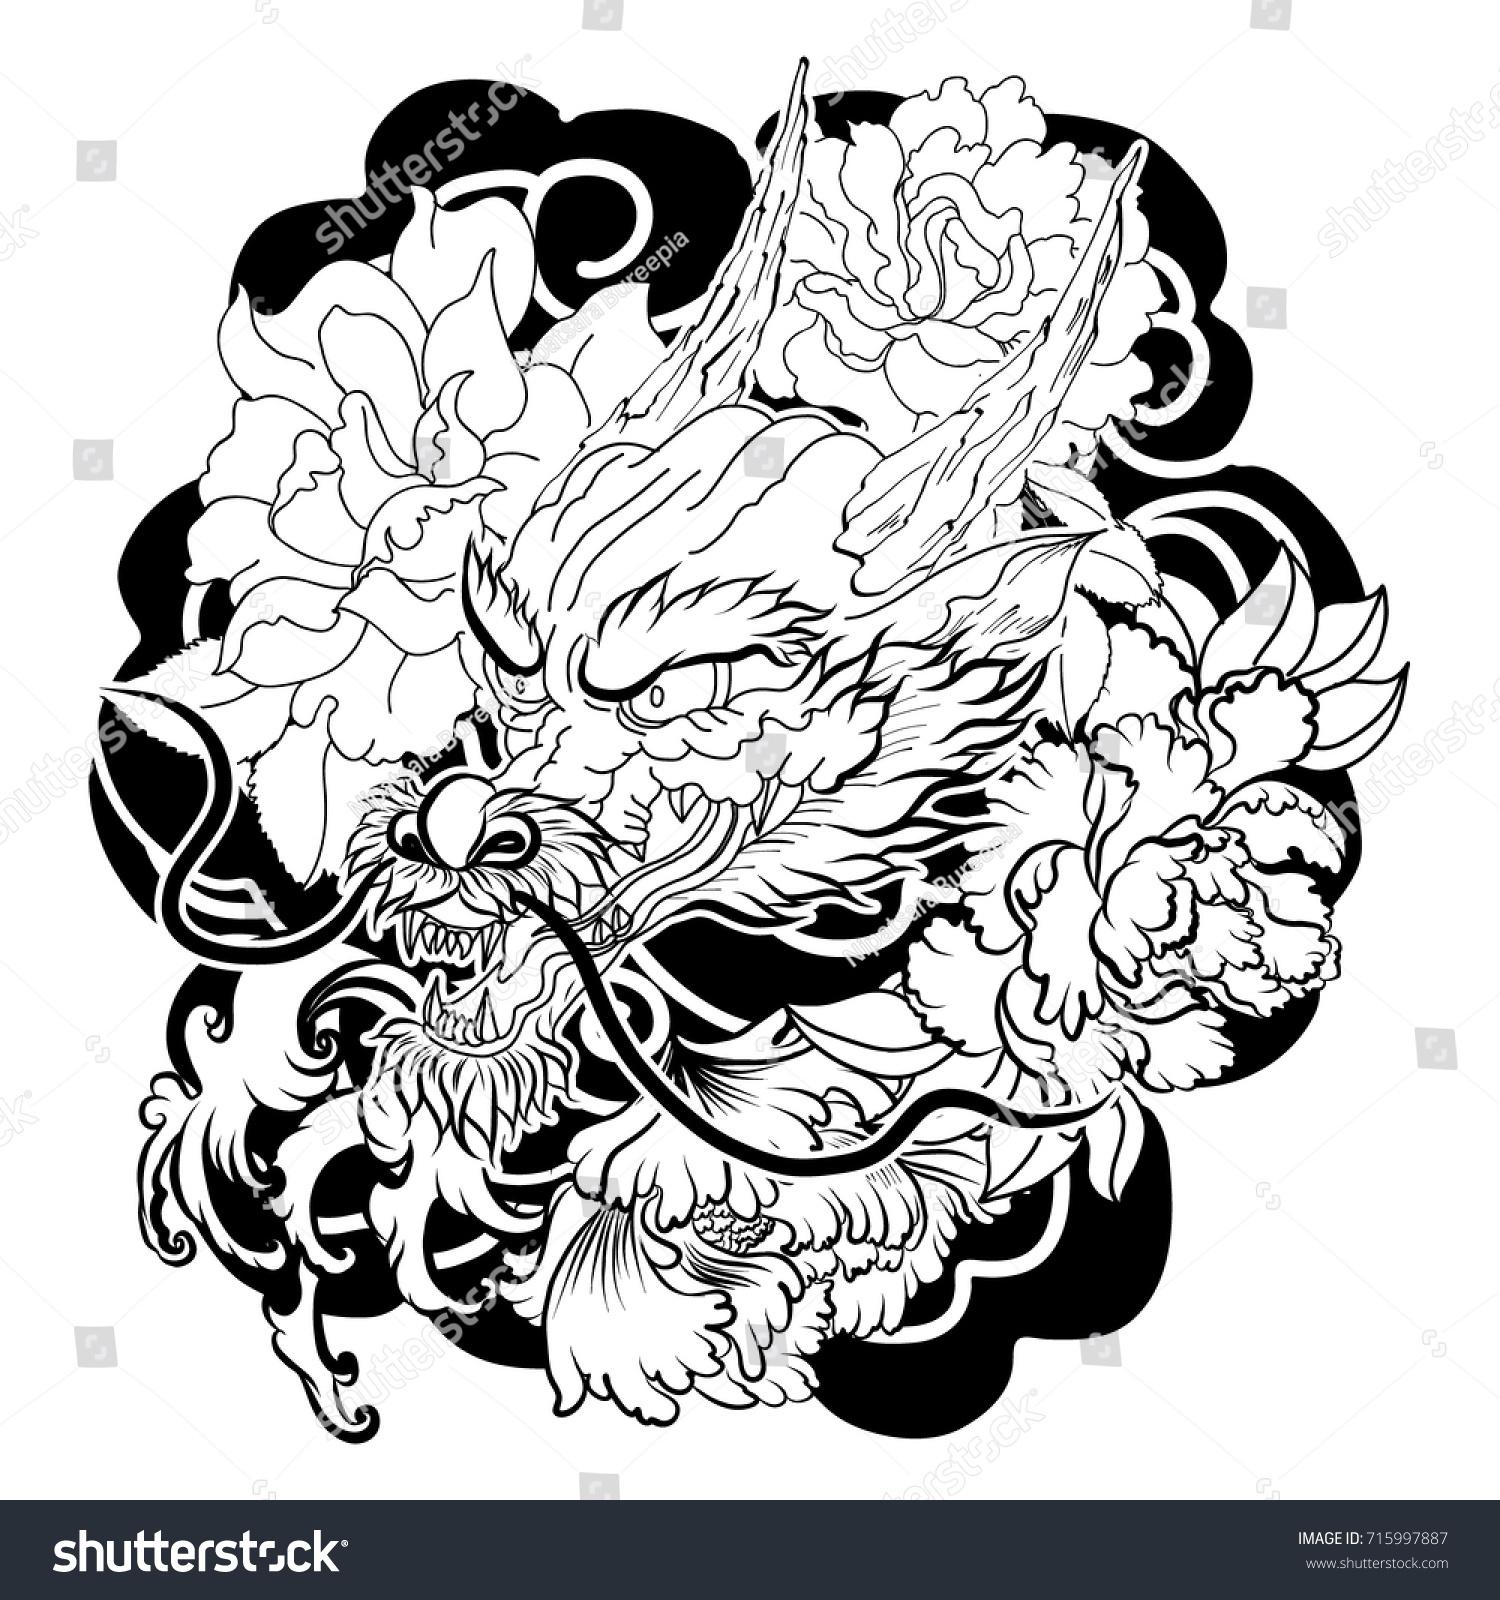 Tattoo design chinese dragon lotus sakura stock vector 2018 tattoo design chinese dragon with lotus sakura and chrysanthemum flowerjapanese art izmirmasajfo Gallery